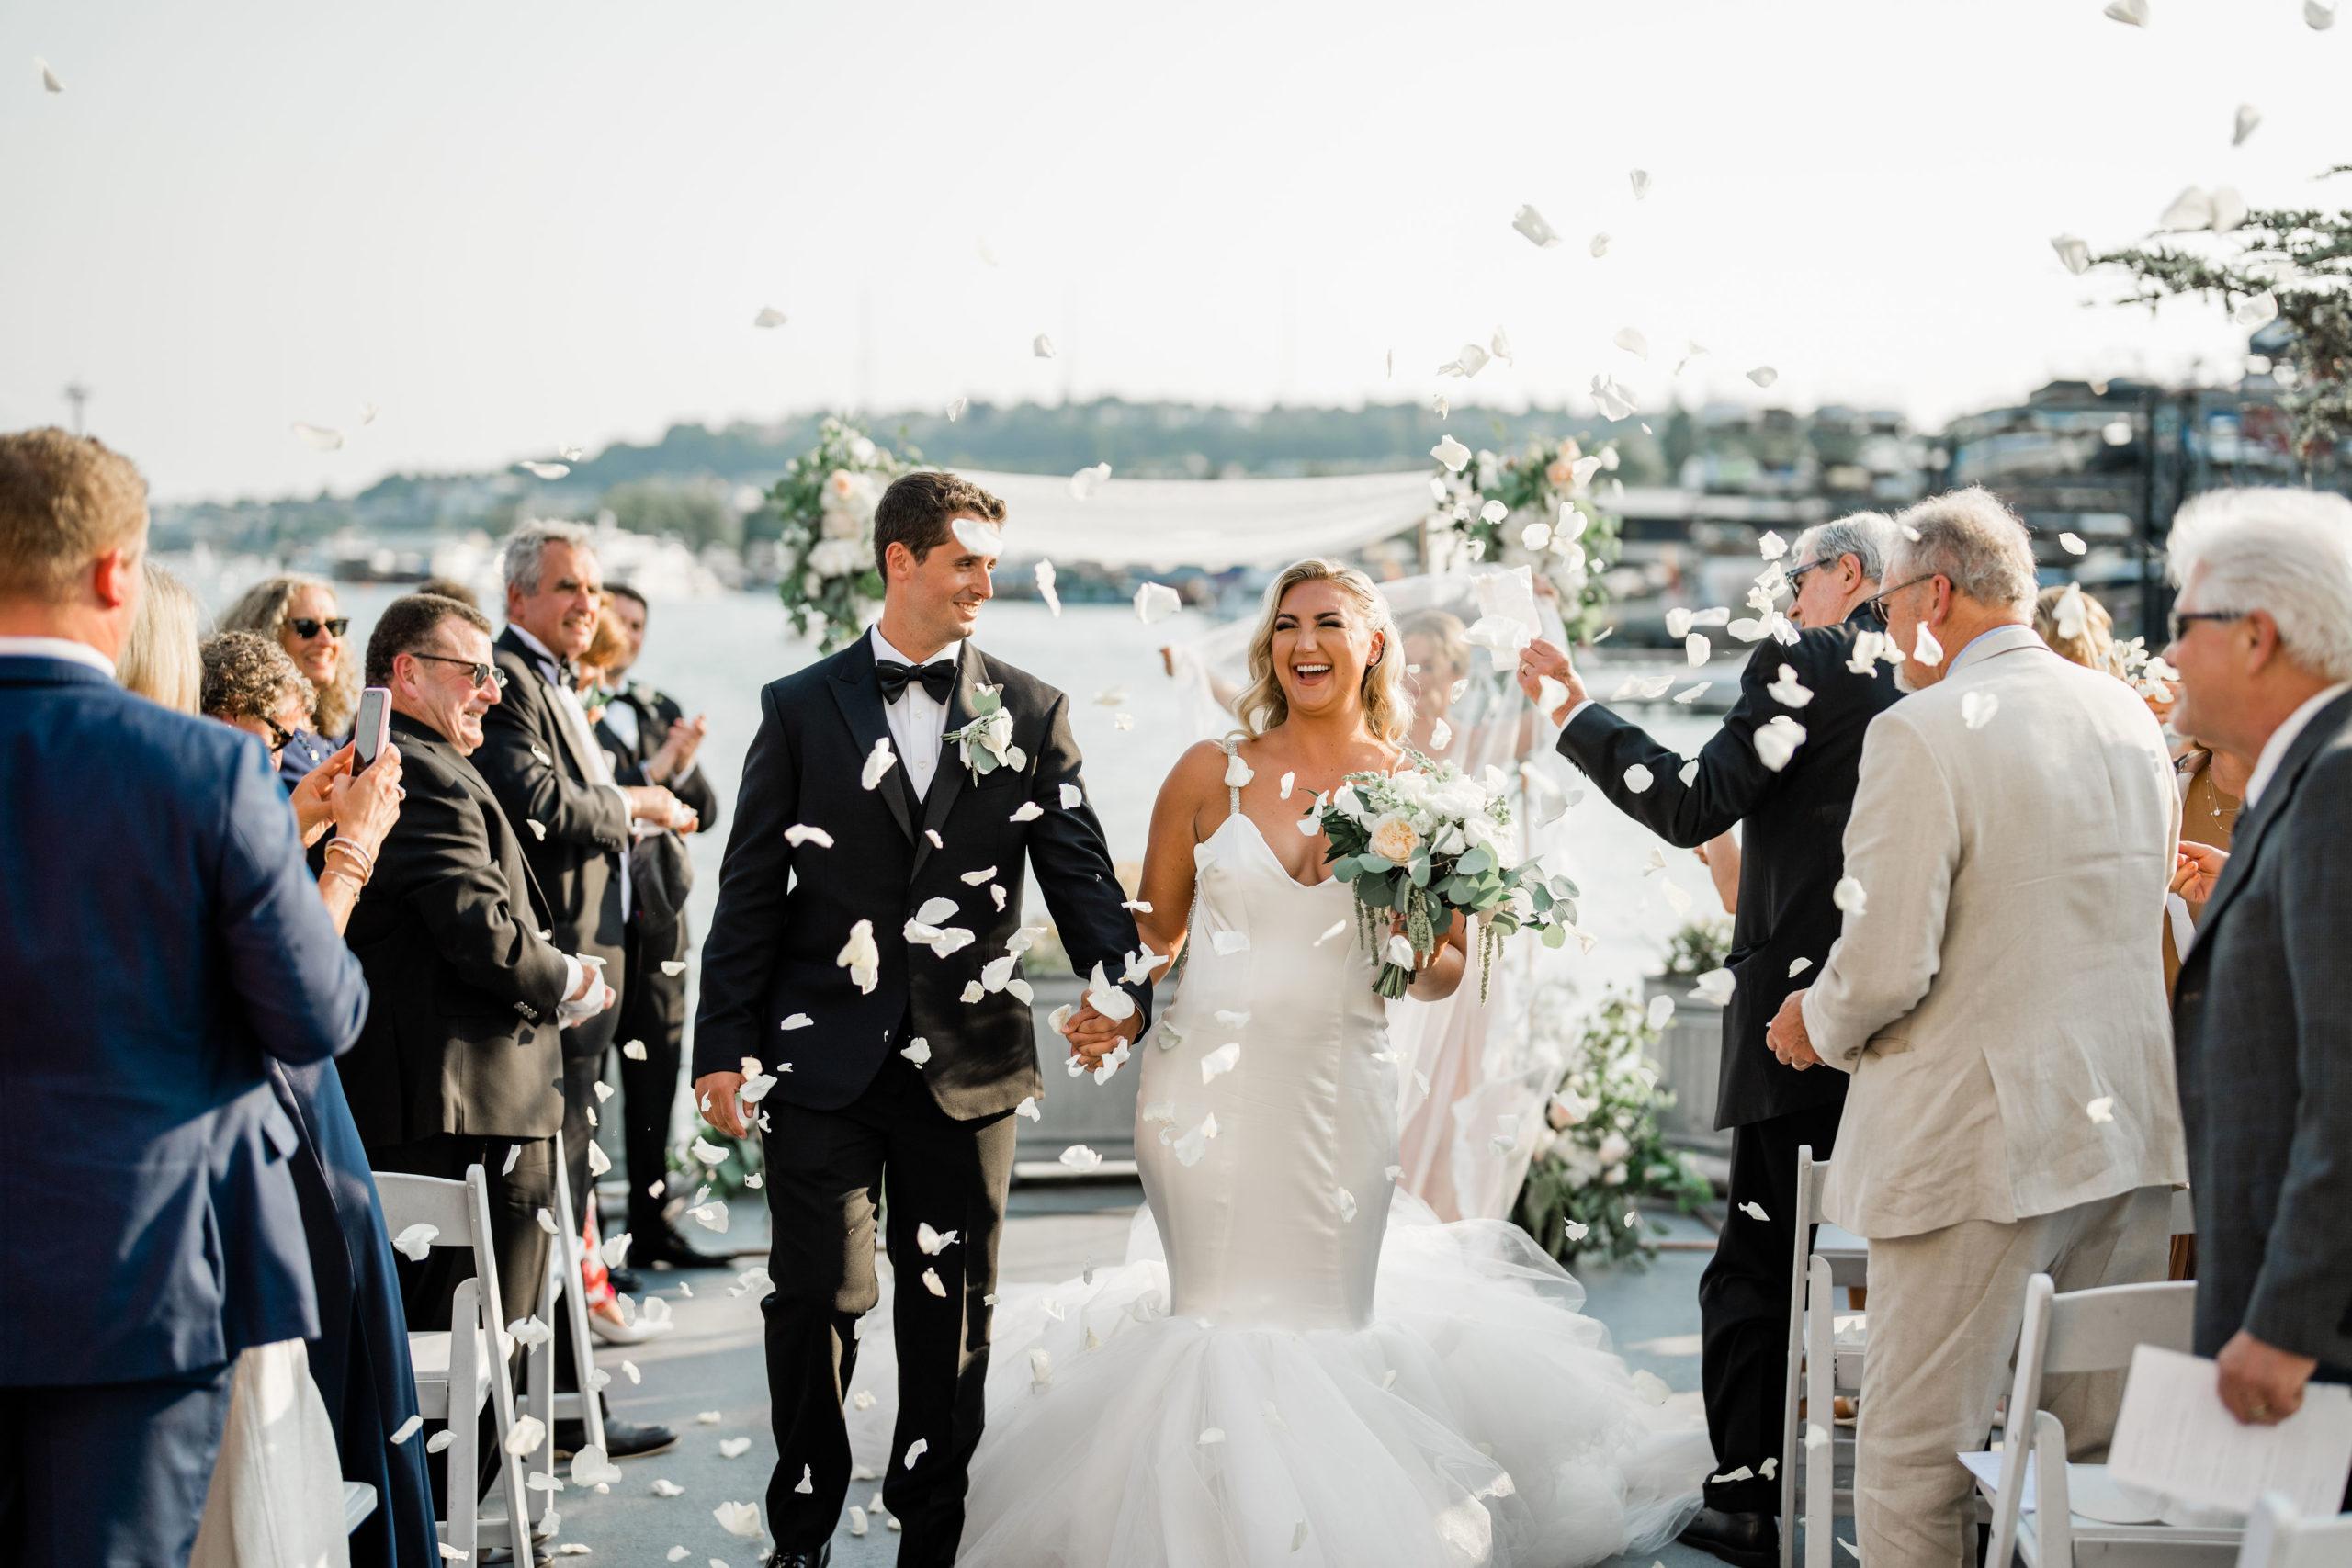 Seattle wedding photographer captures first kiss